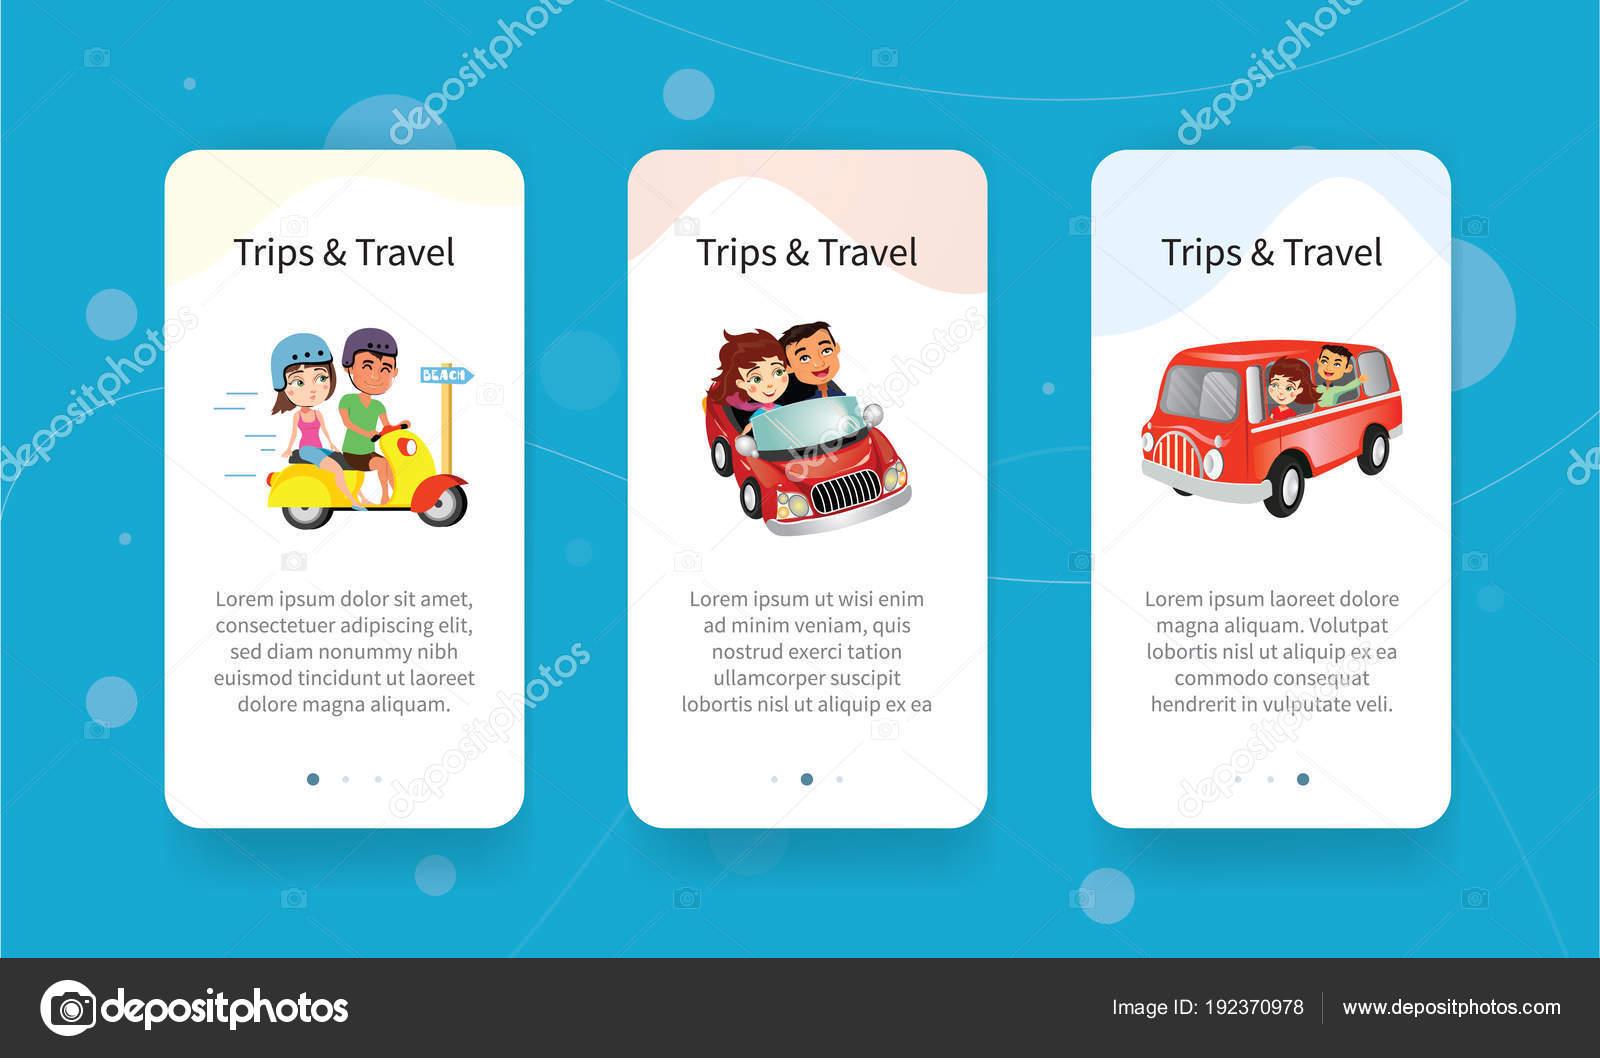 Sablona Jezdec Karet Dva Cestujici Na Motorky Auta A Minibus